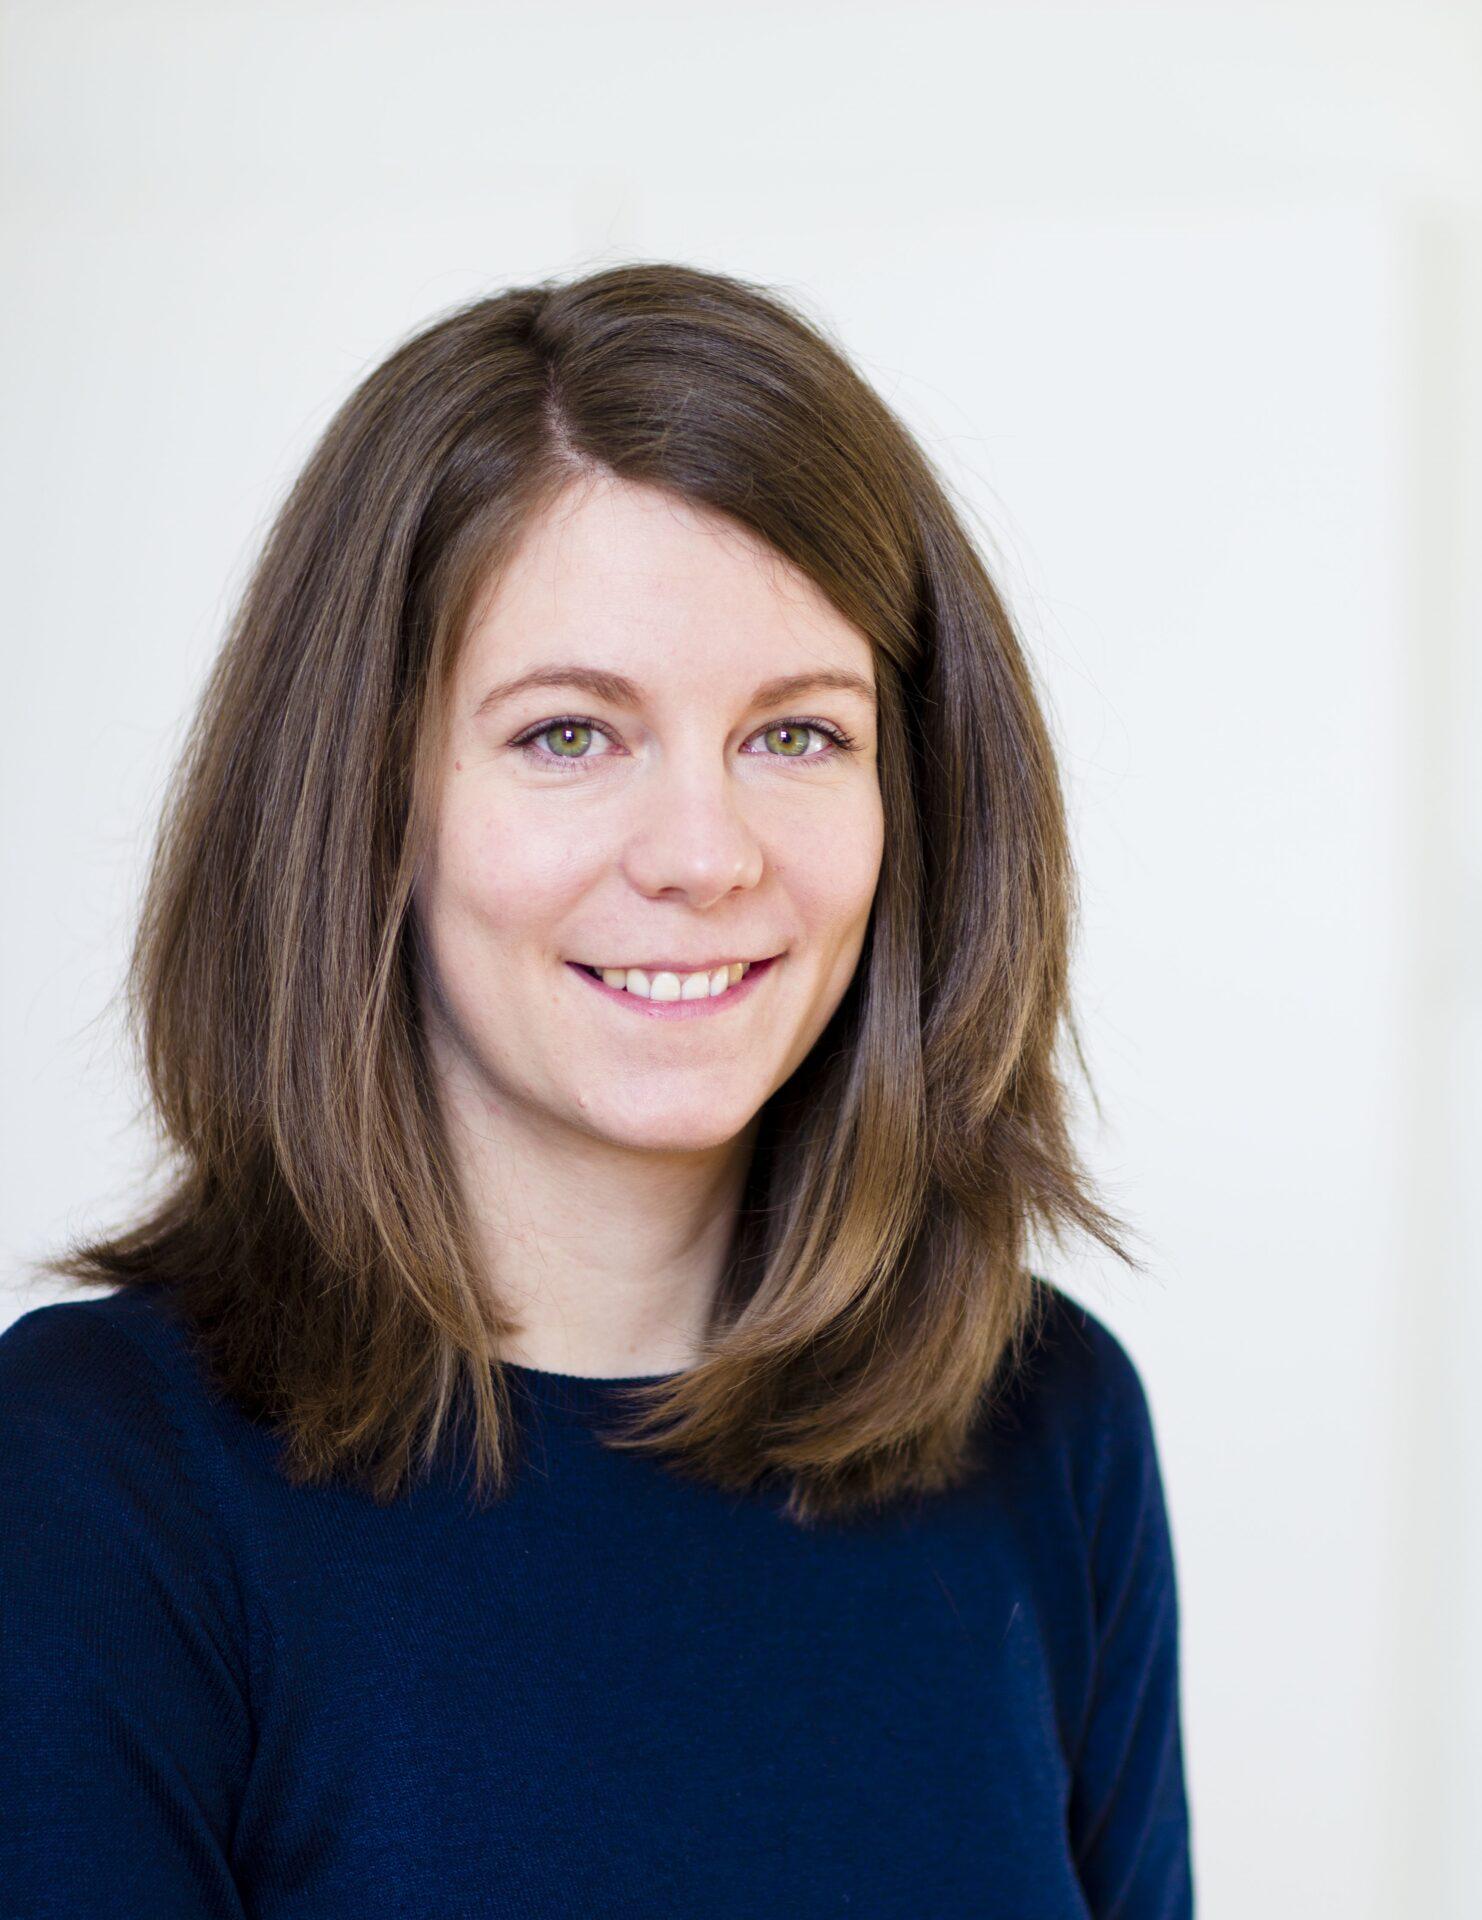 Profile picture Gina Waibel (c) Petra Blauensteiner